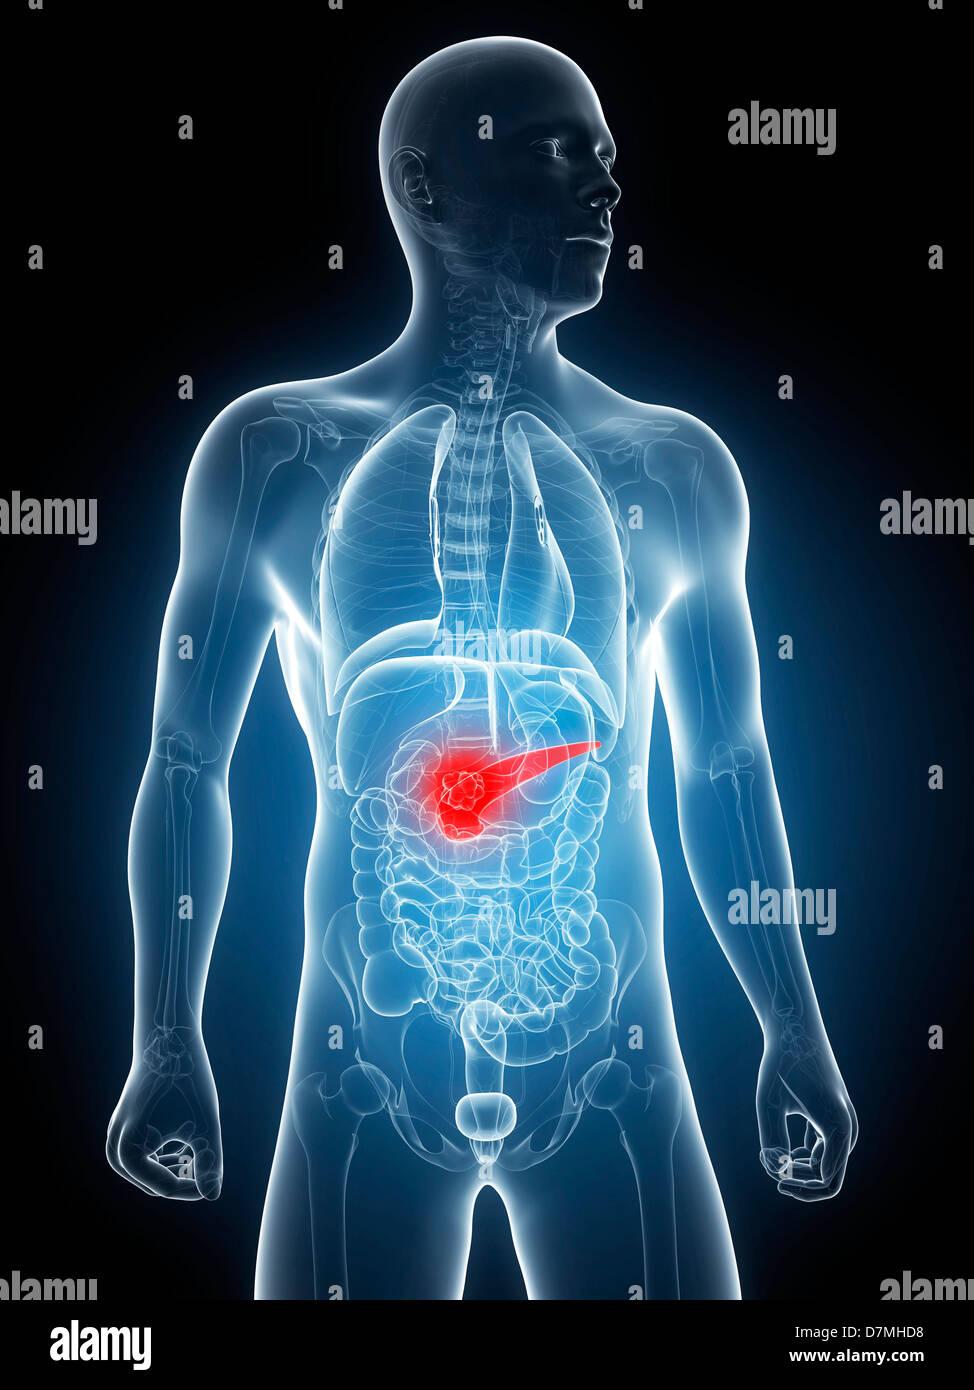 Pancreas Cancer Stockfotos & Pancreas Cancer Bilder - Alamy